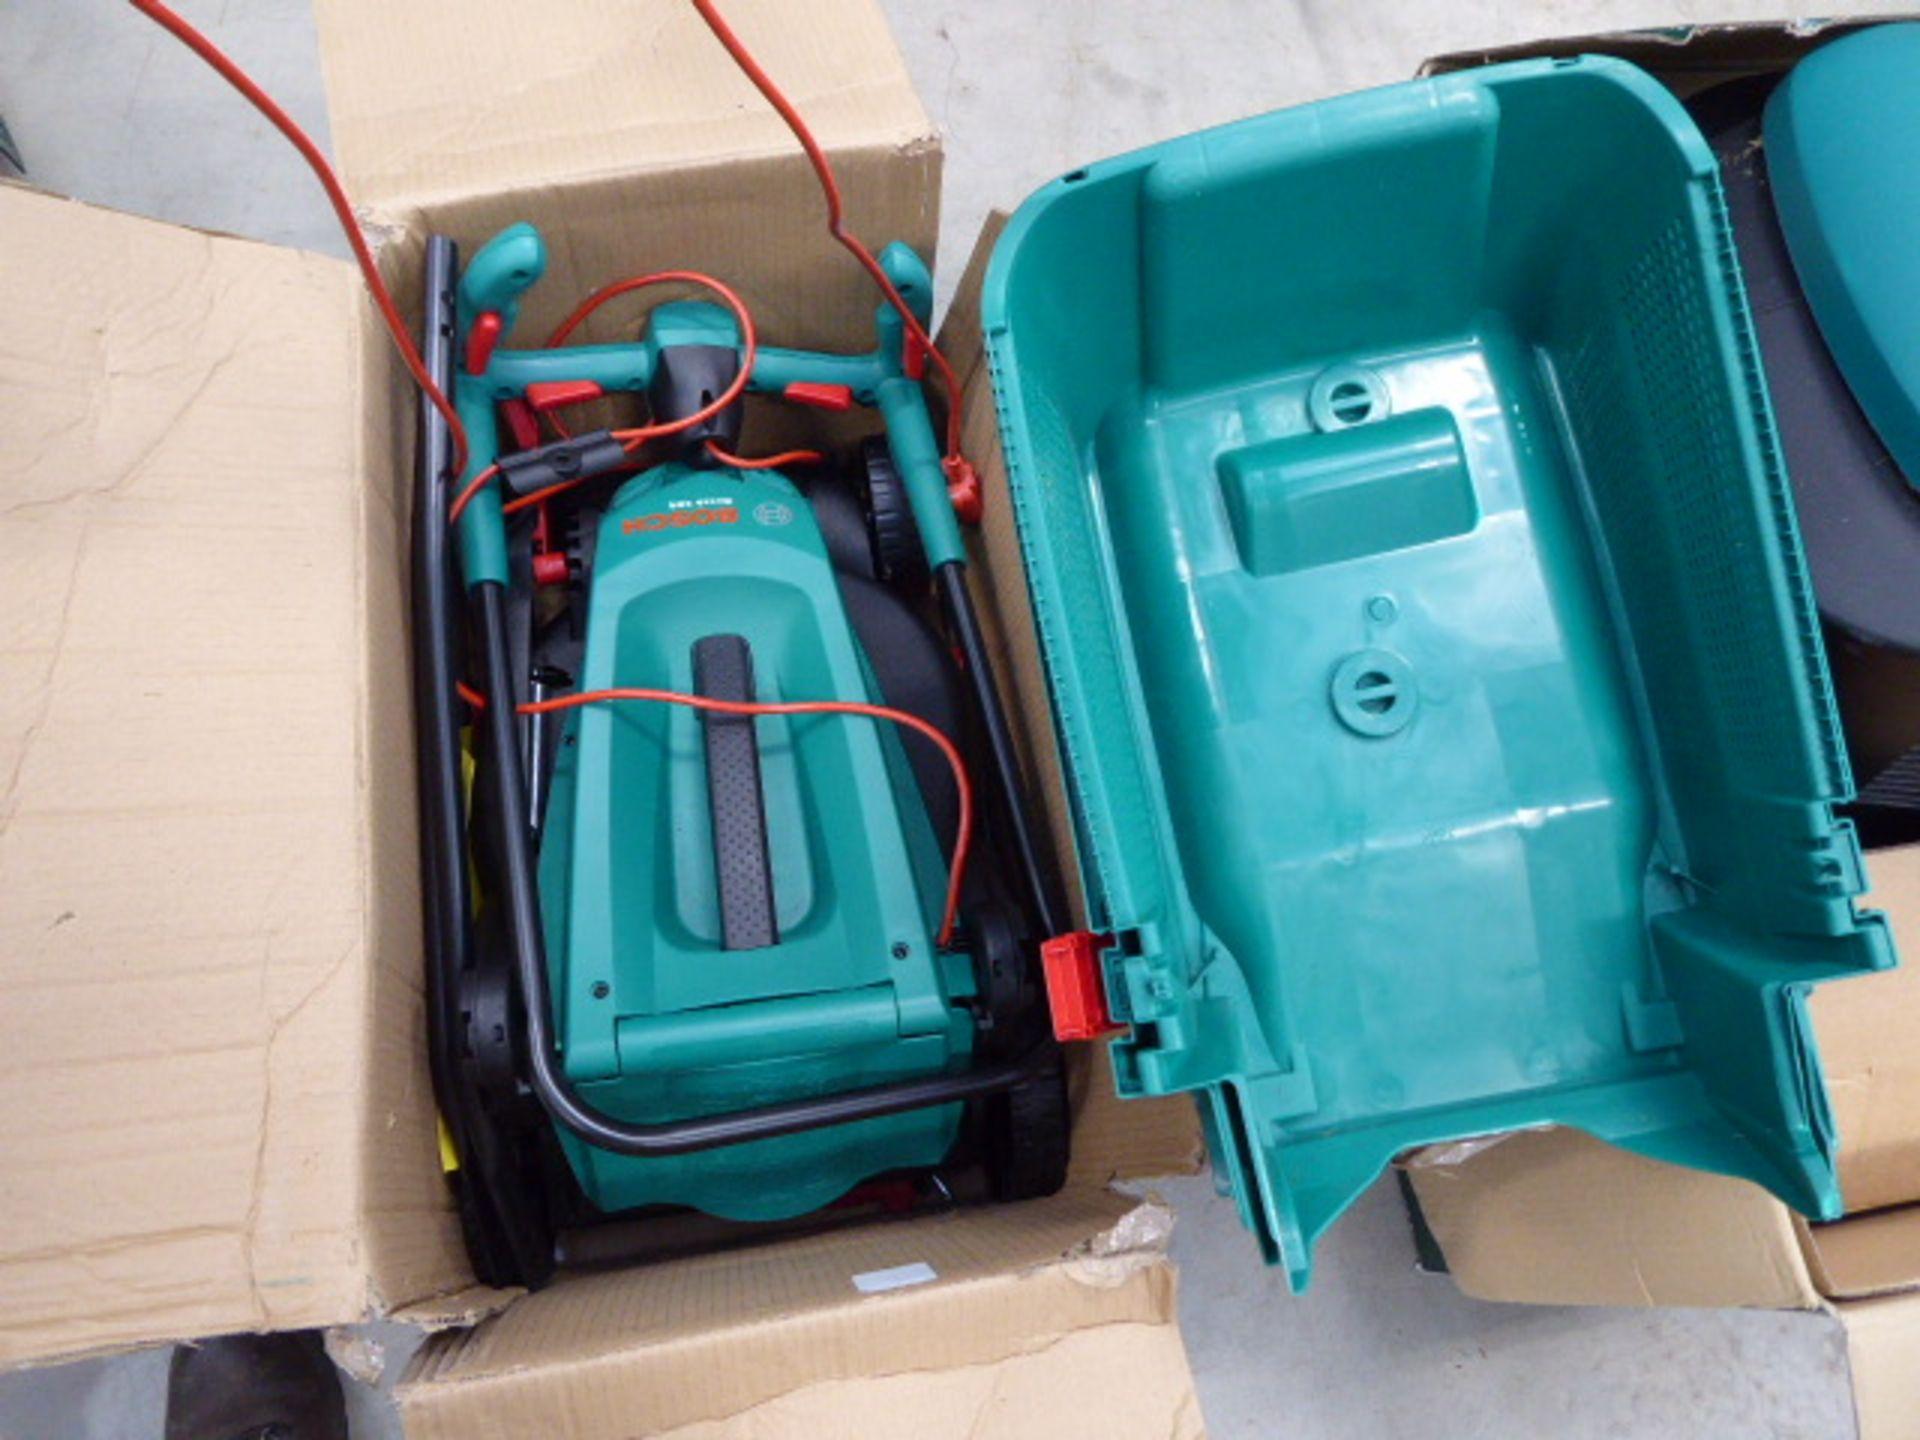 Boxed Bosch electric Rotak lawnmower